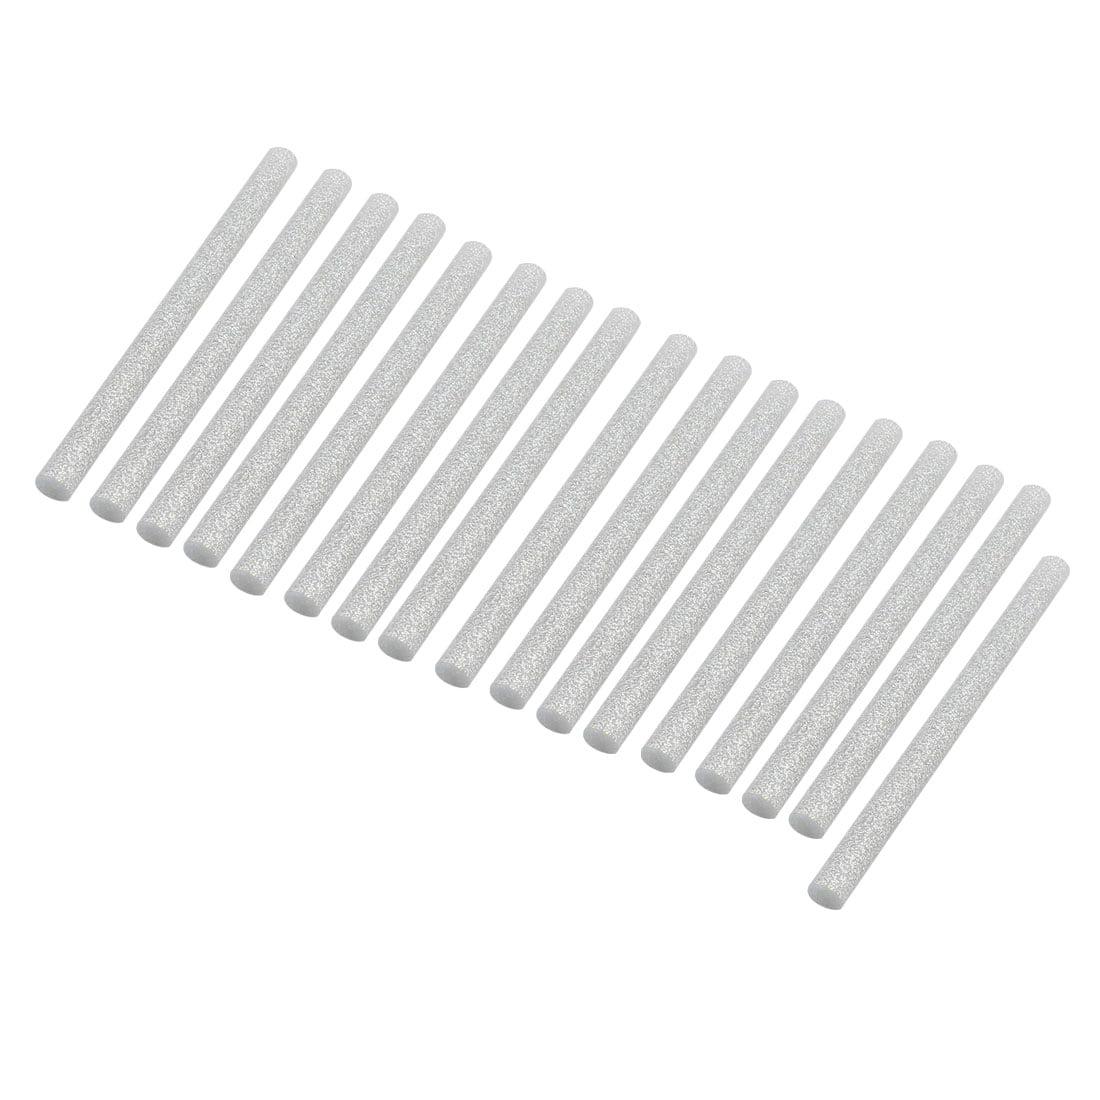 17pcs 7mm x 100mm Hot Melt Glue Sticks Silver Tone for DIY Small Craft Projects